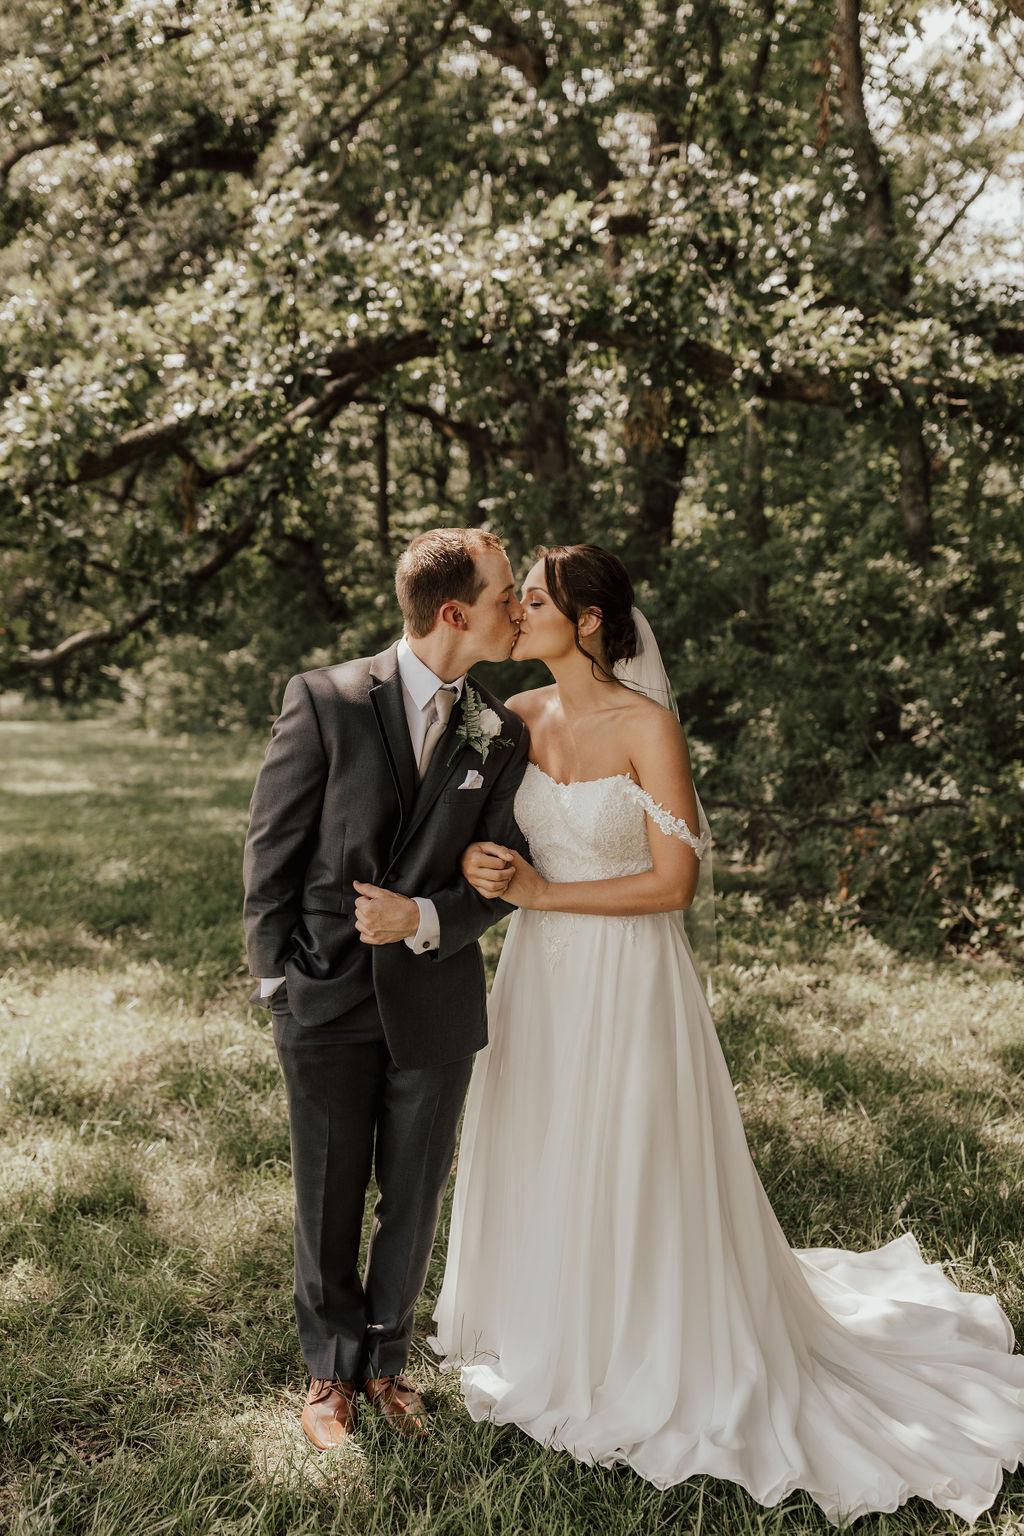 StLouis-Wedding-Photographer-Taylor+Michael-Portraits28.jpg